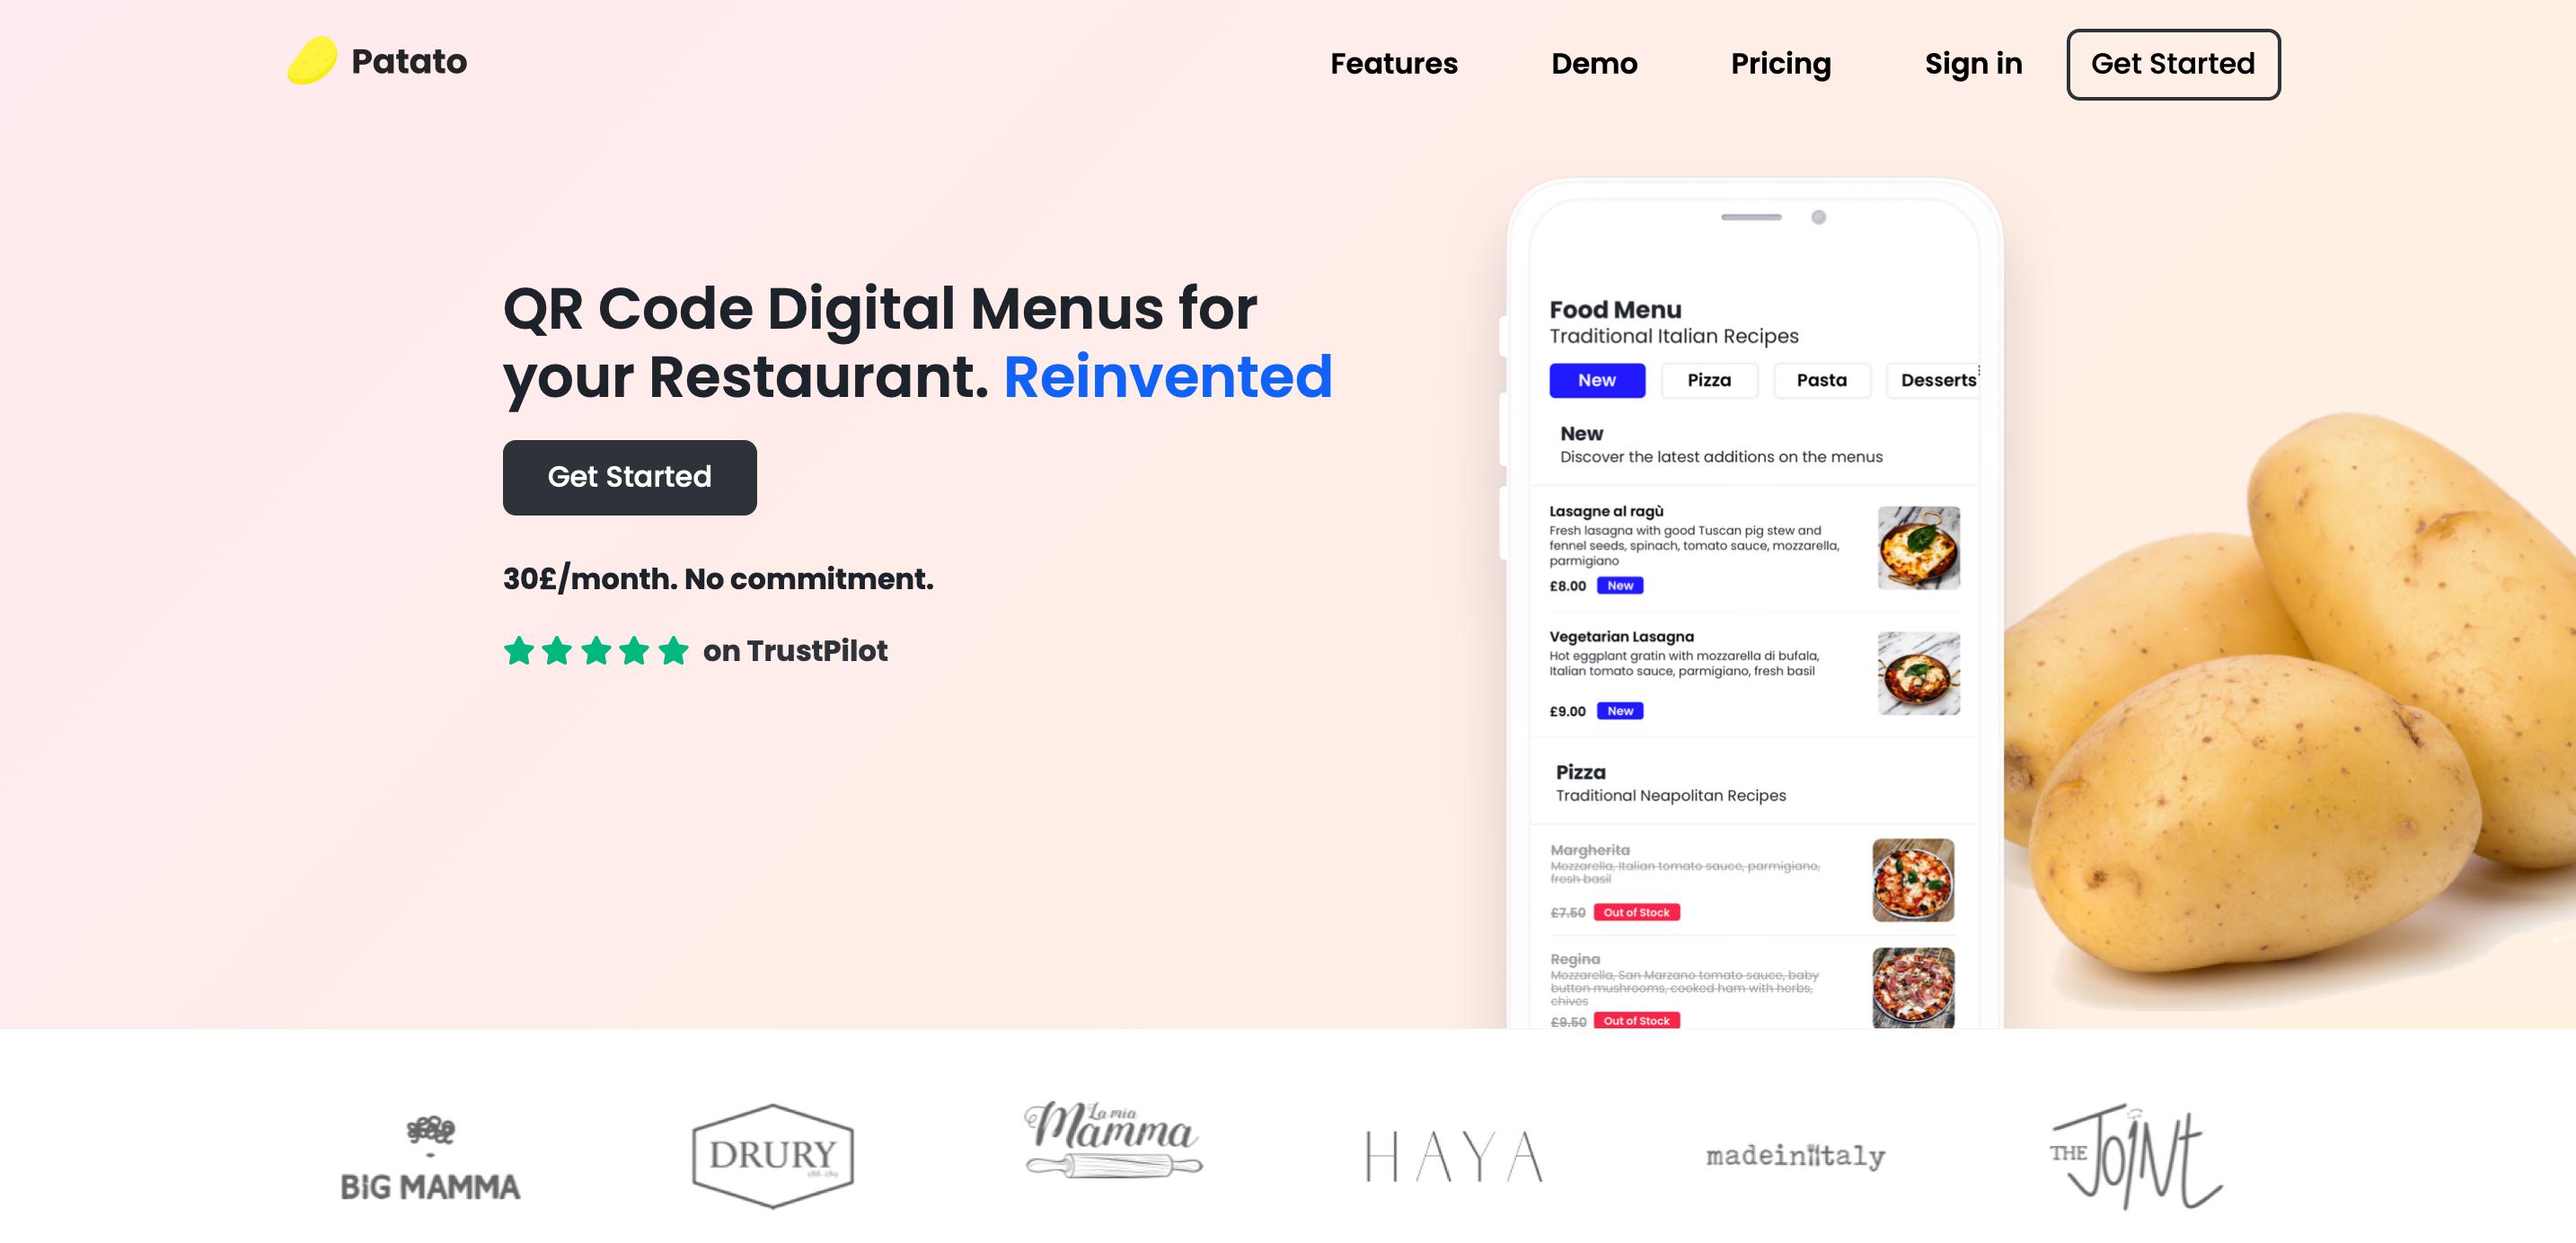 QR code digital menus for your restaurant